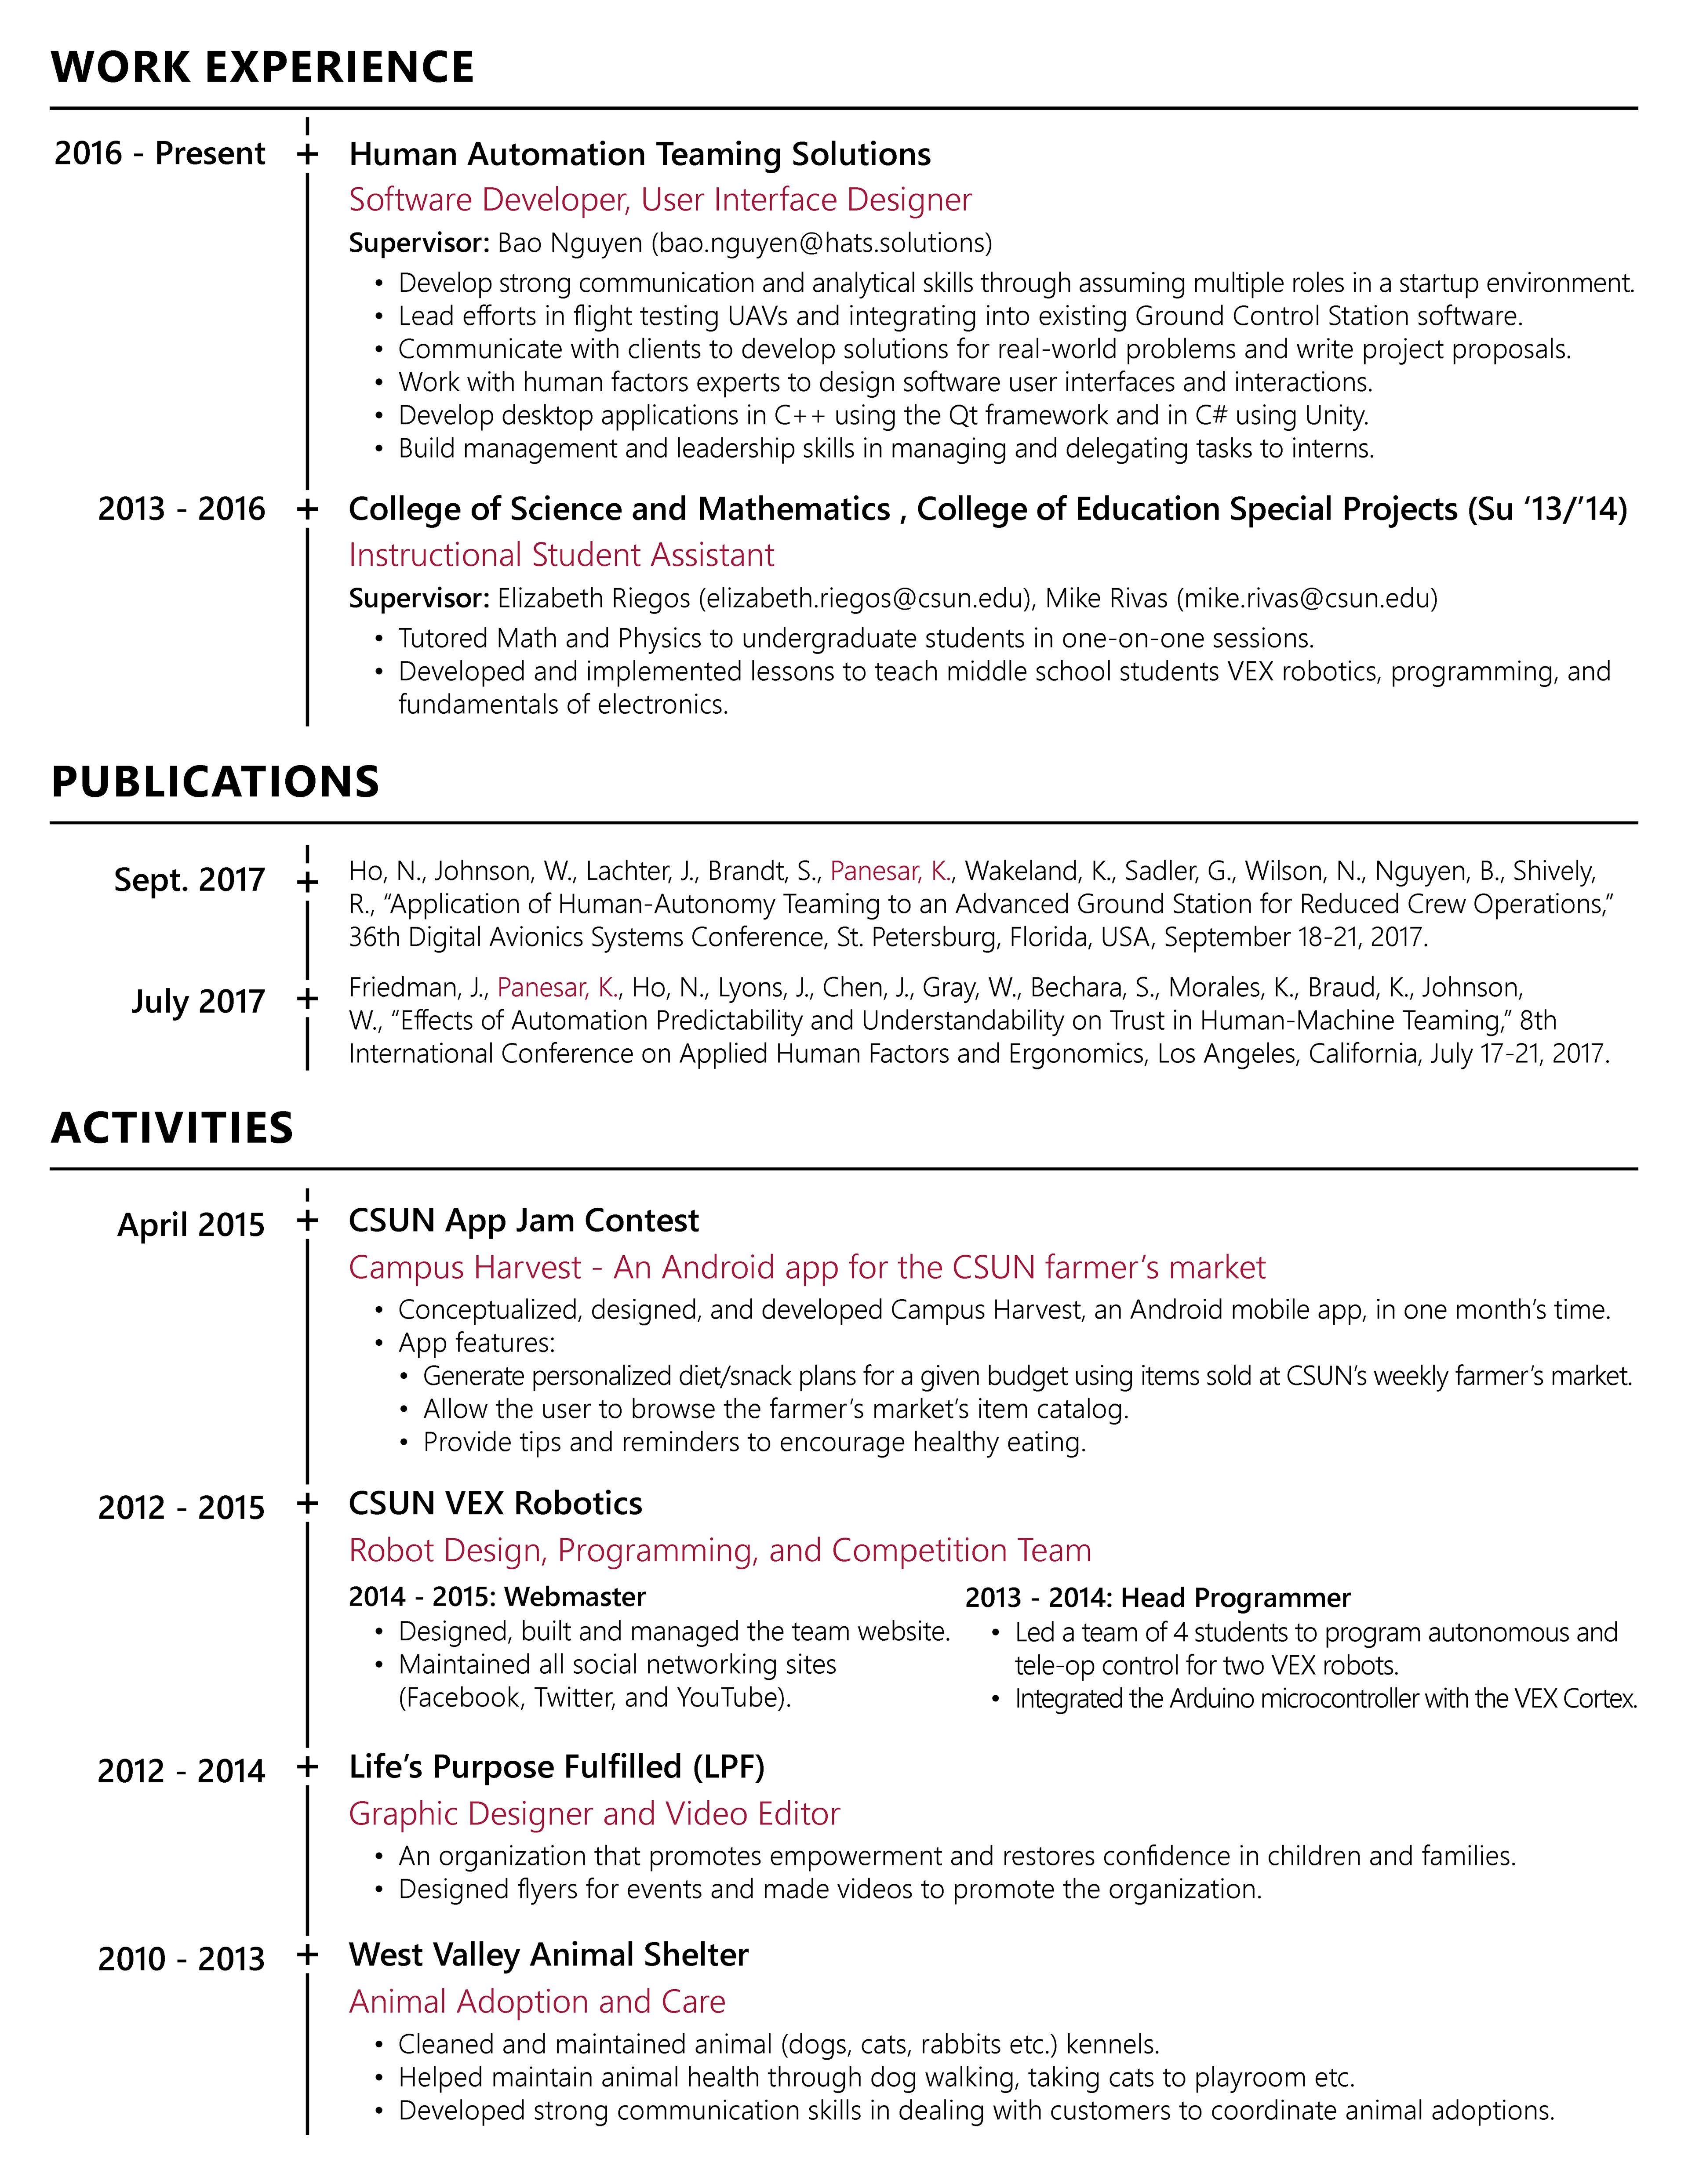 Karanvir Panesar - Curriculum Vitae